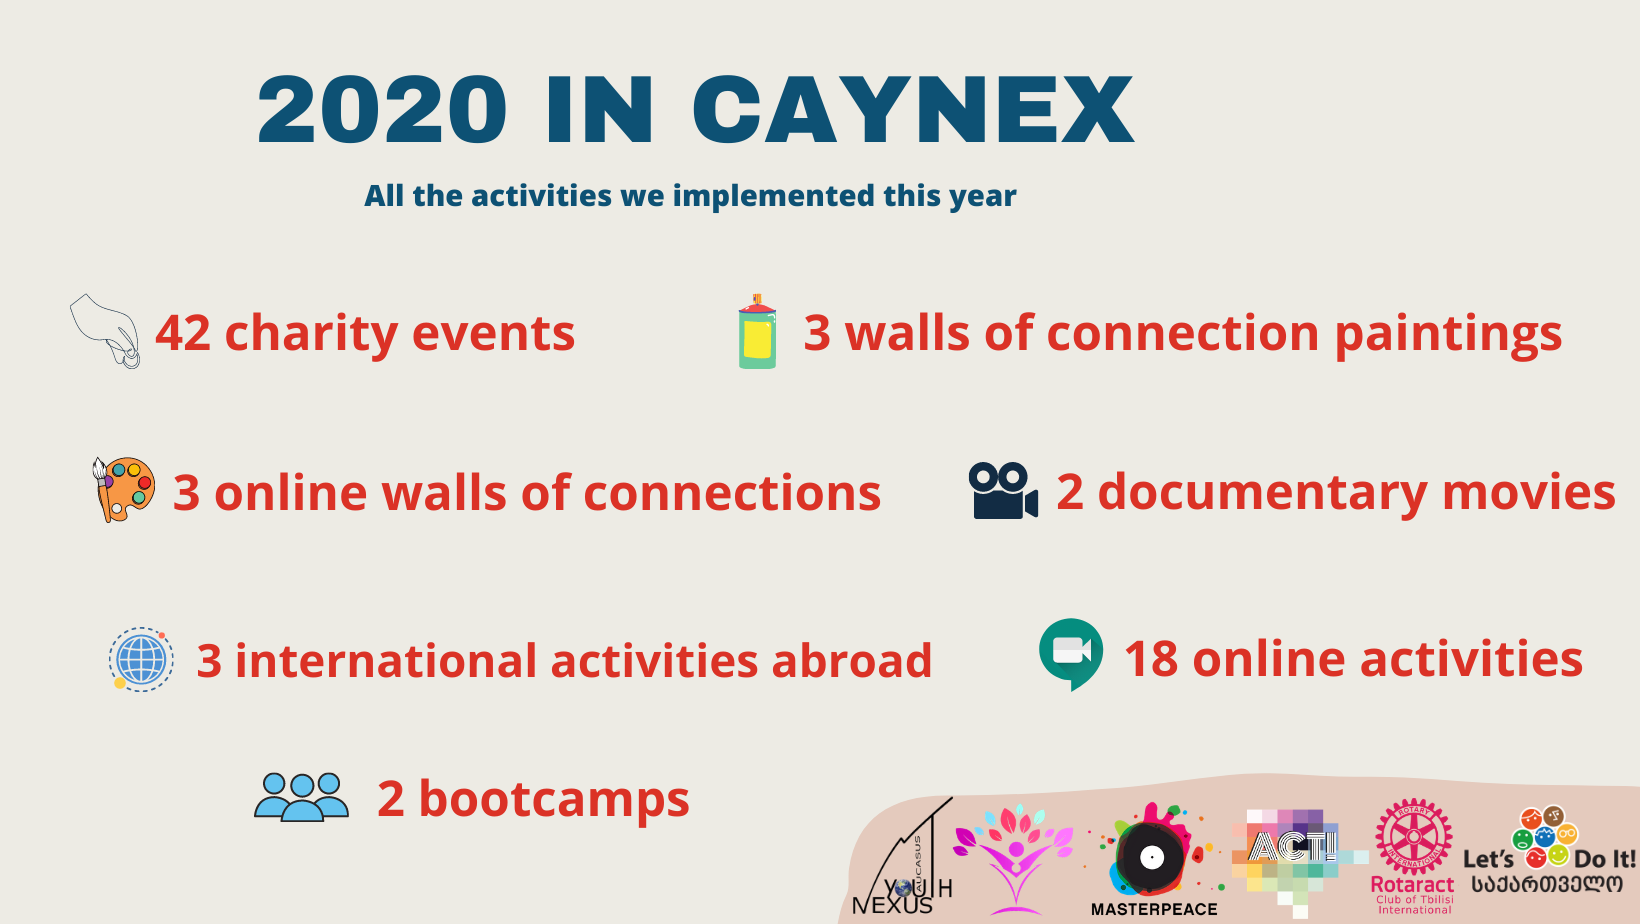 2020 IN CAYNEX